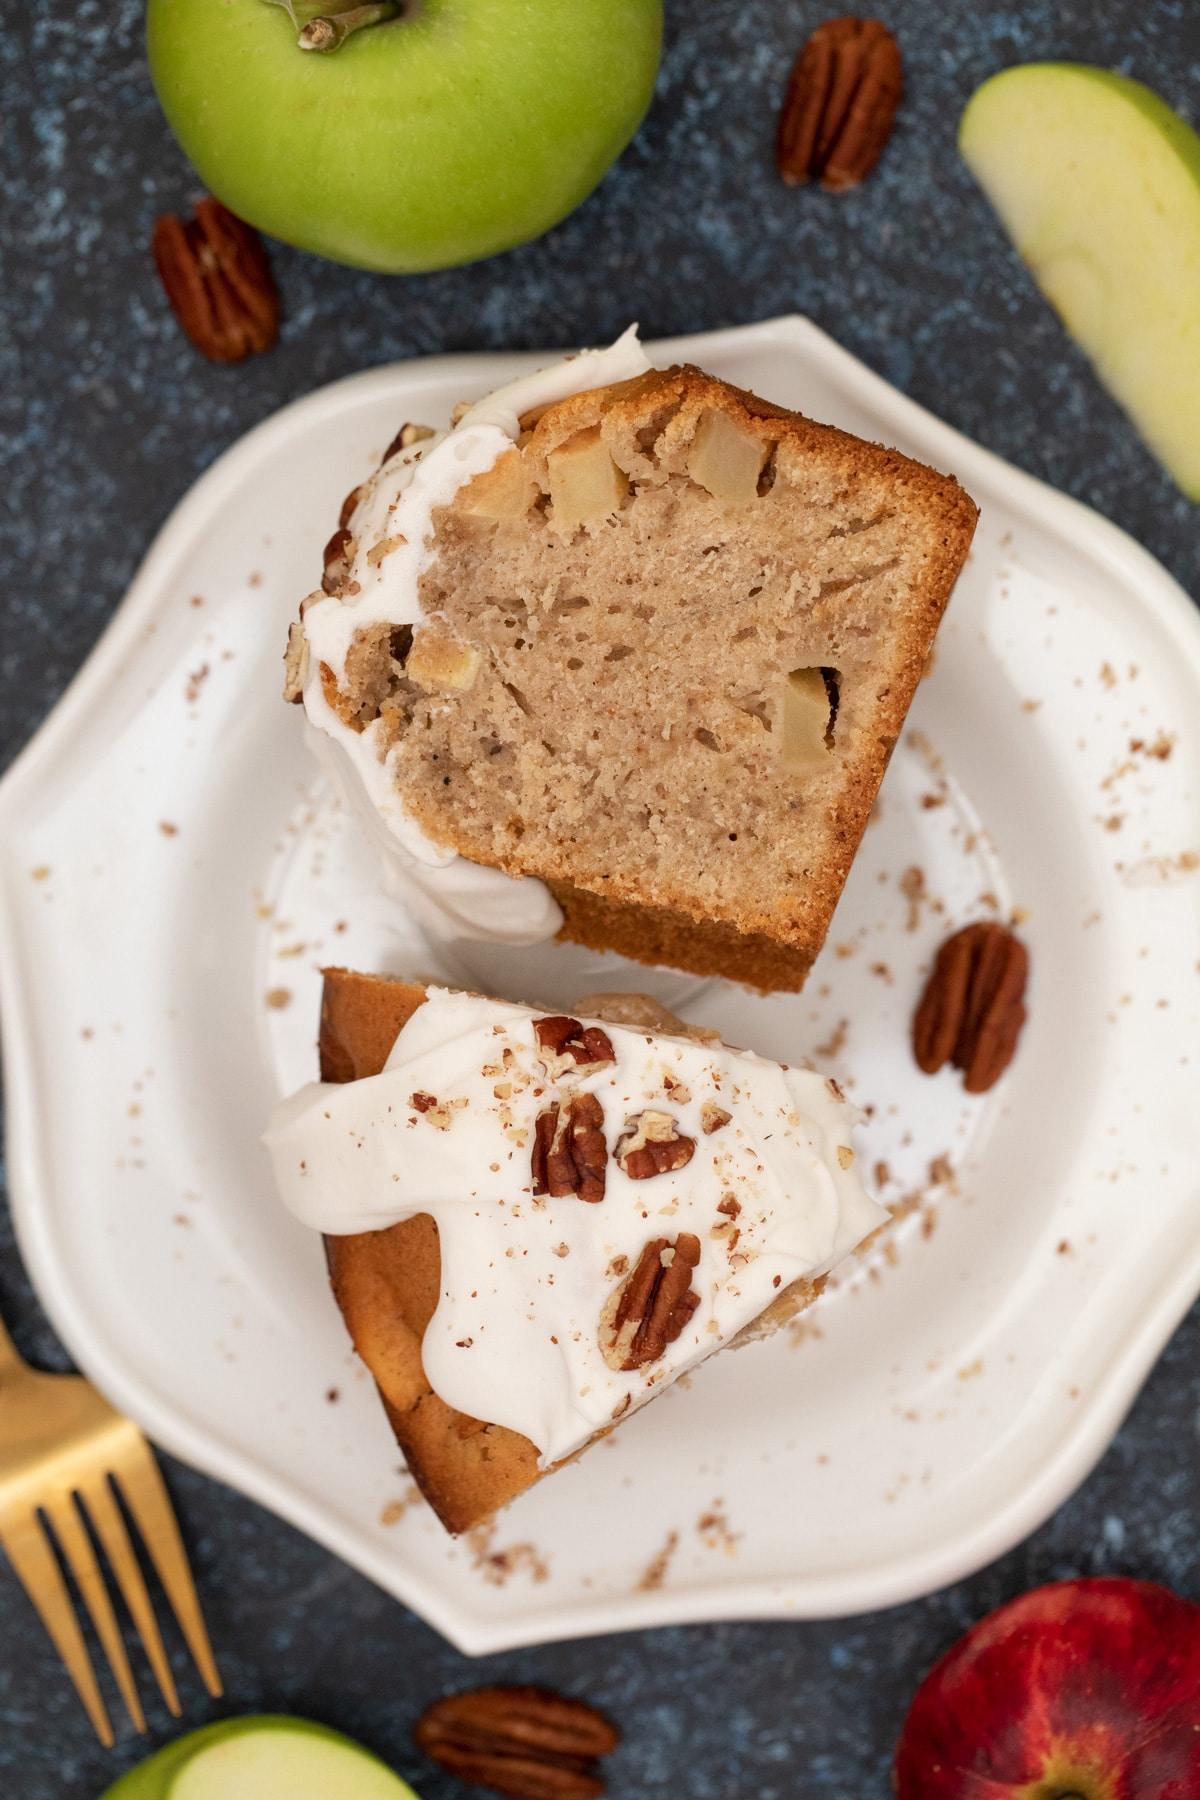 Slice of cake on plate